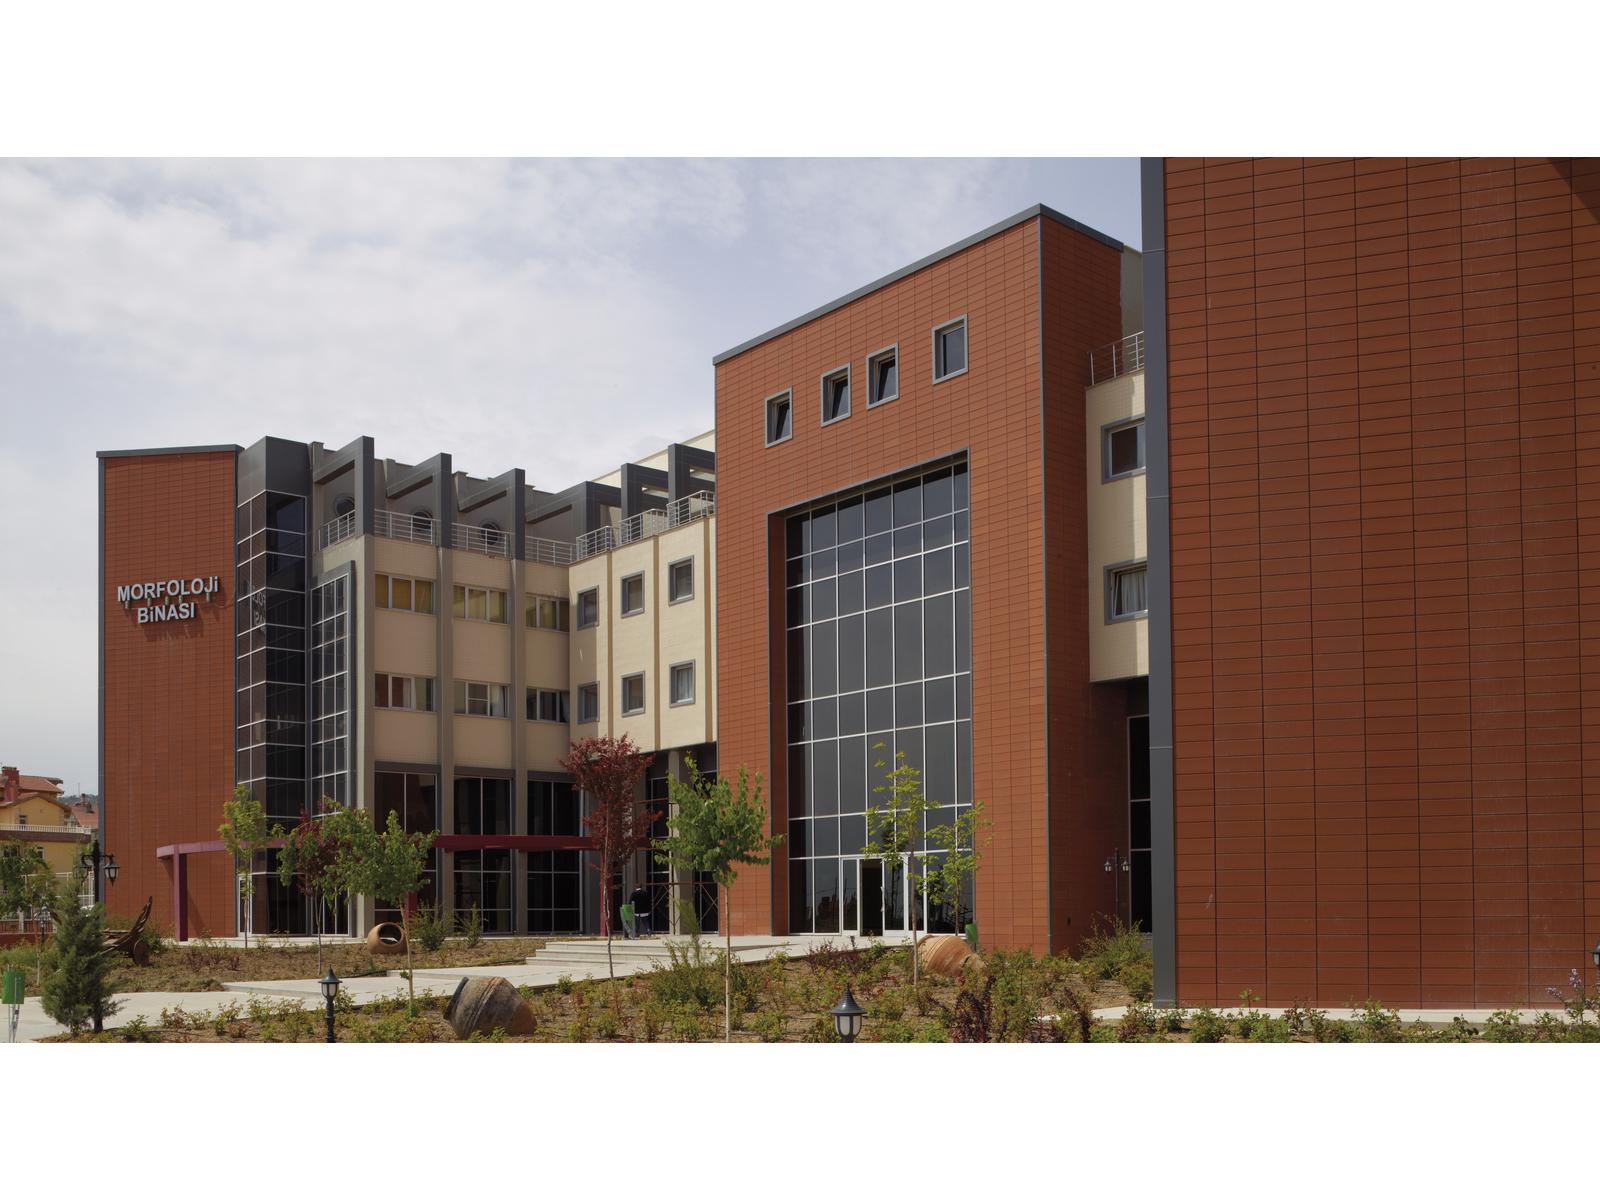 Meram Tıp Fakültesi Morfoloji Hastanesi